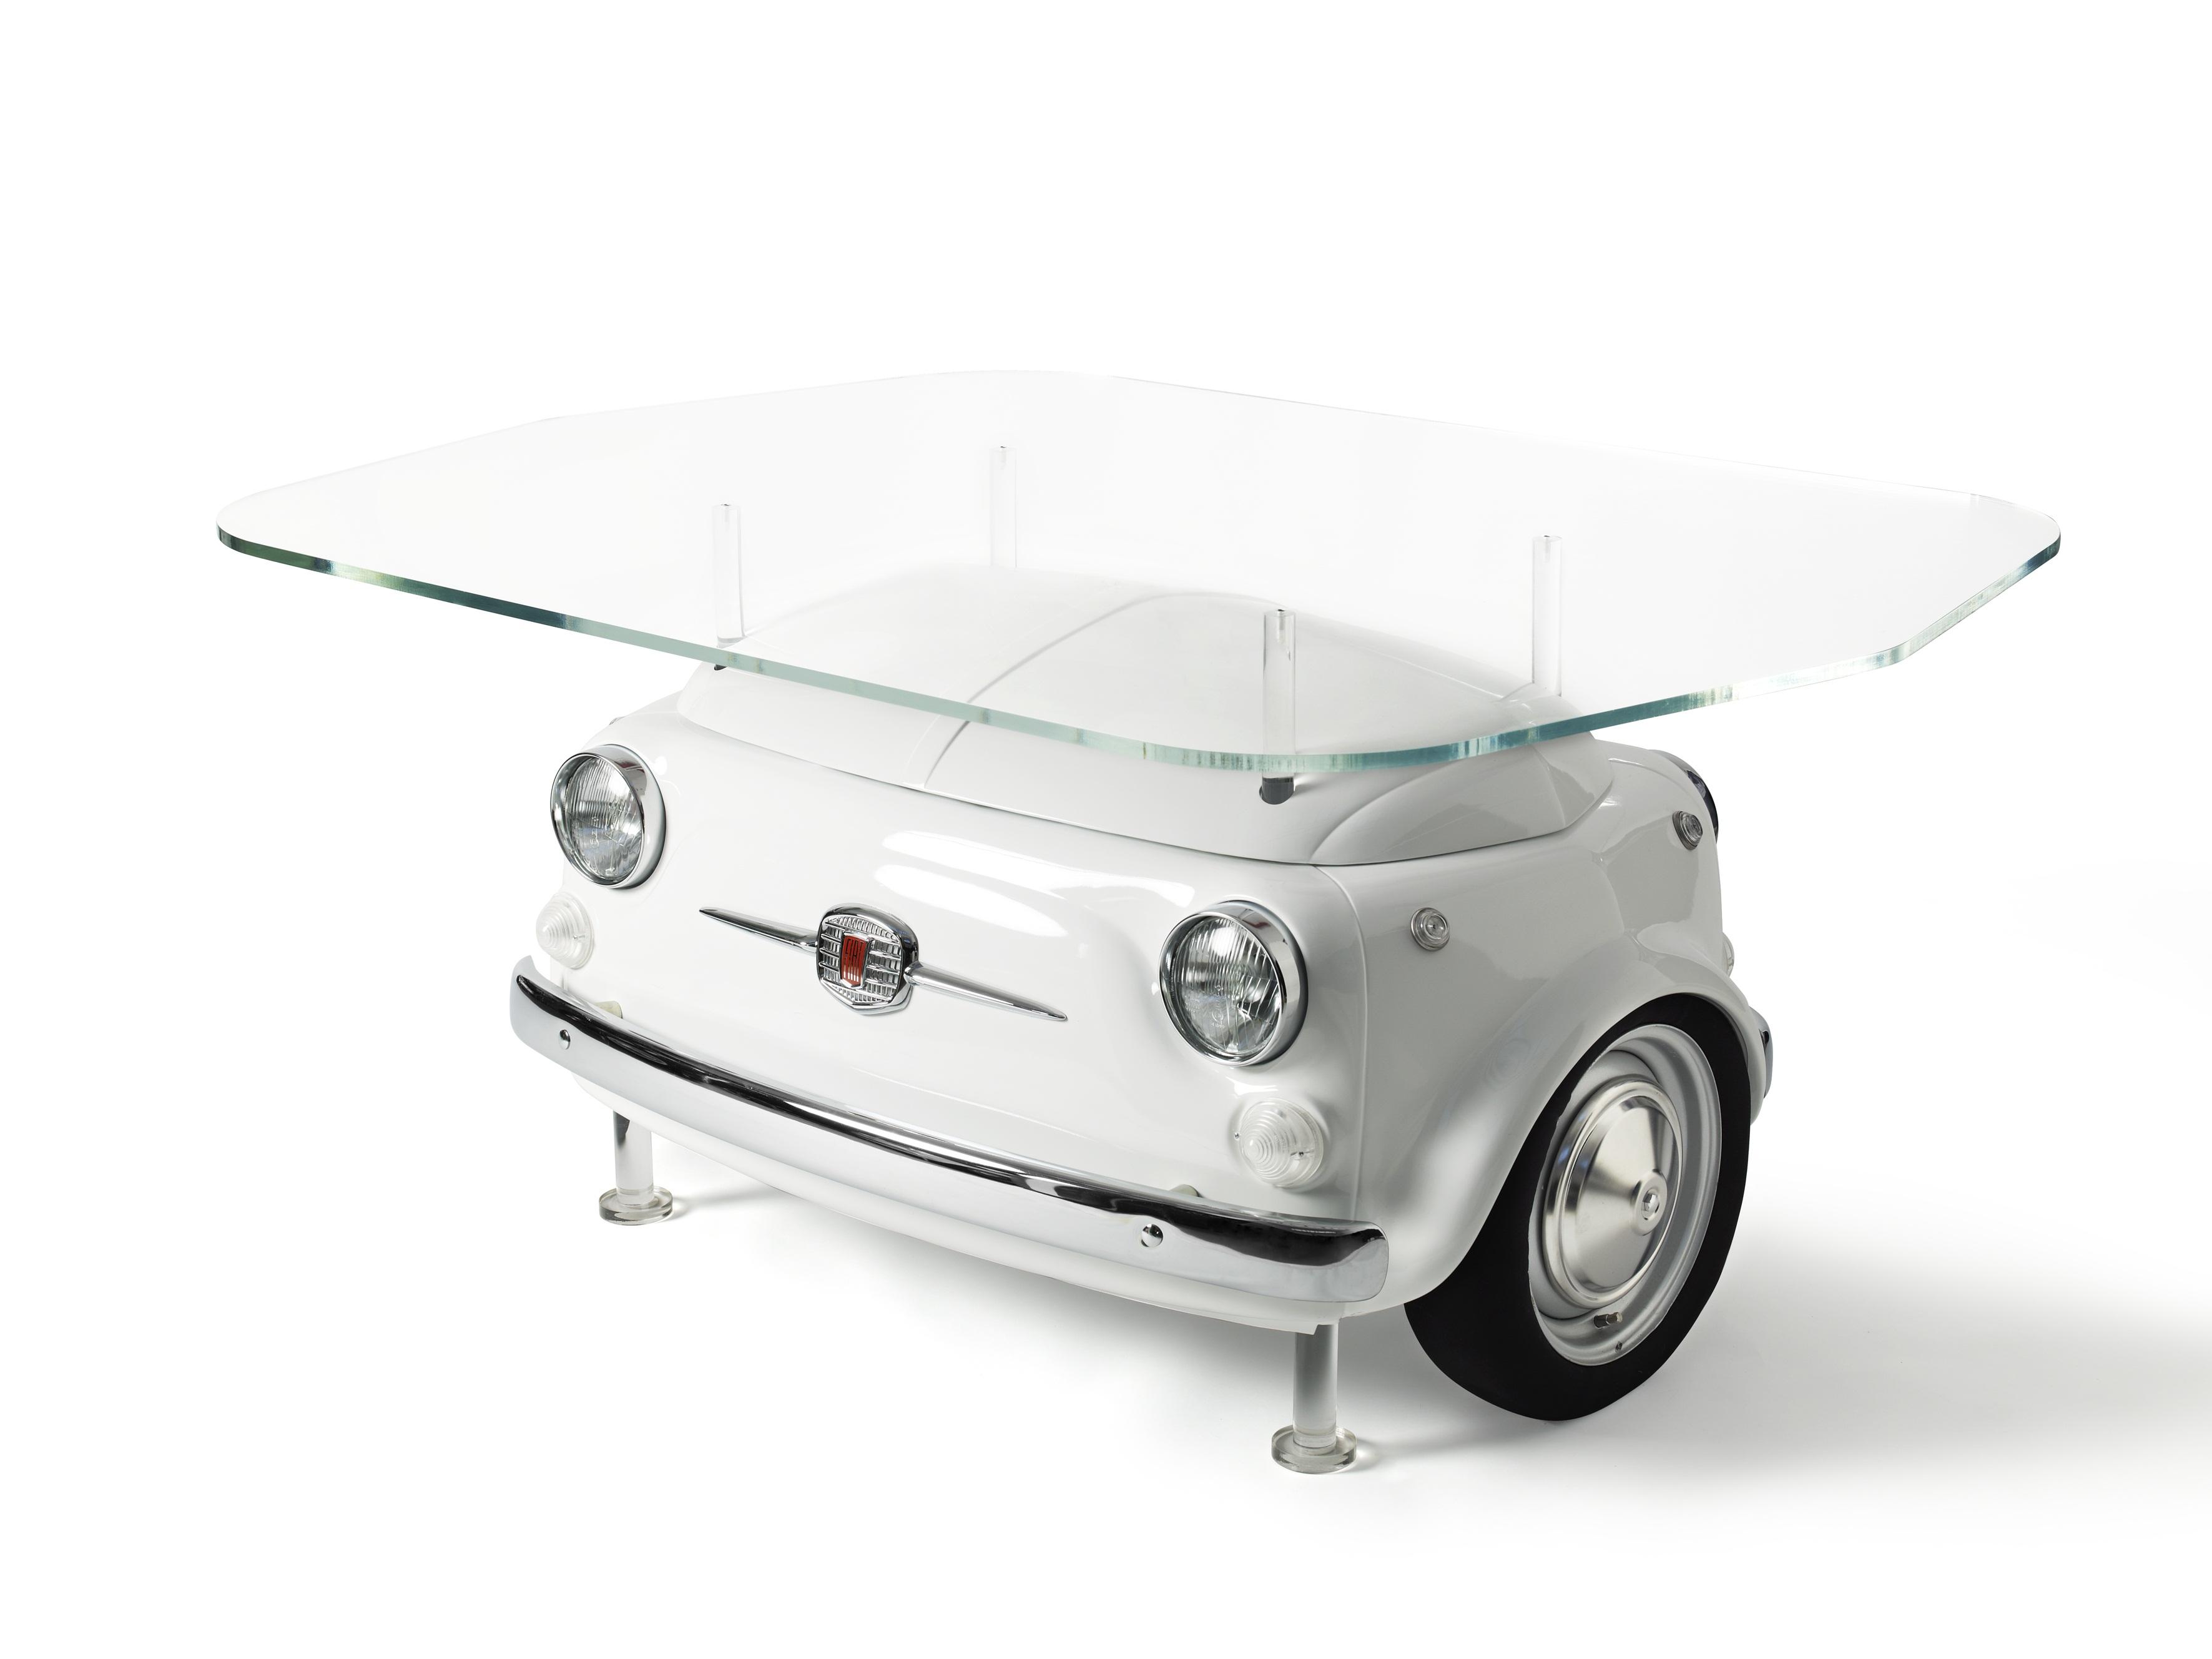 fiat 500 giocattoli e gadget per veri addicted. Black Bedroom Furniture Sets. Home Design Ideas